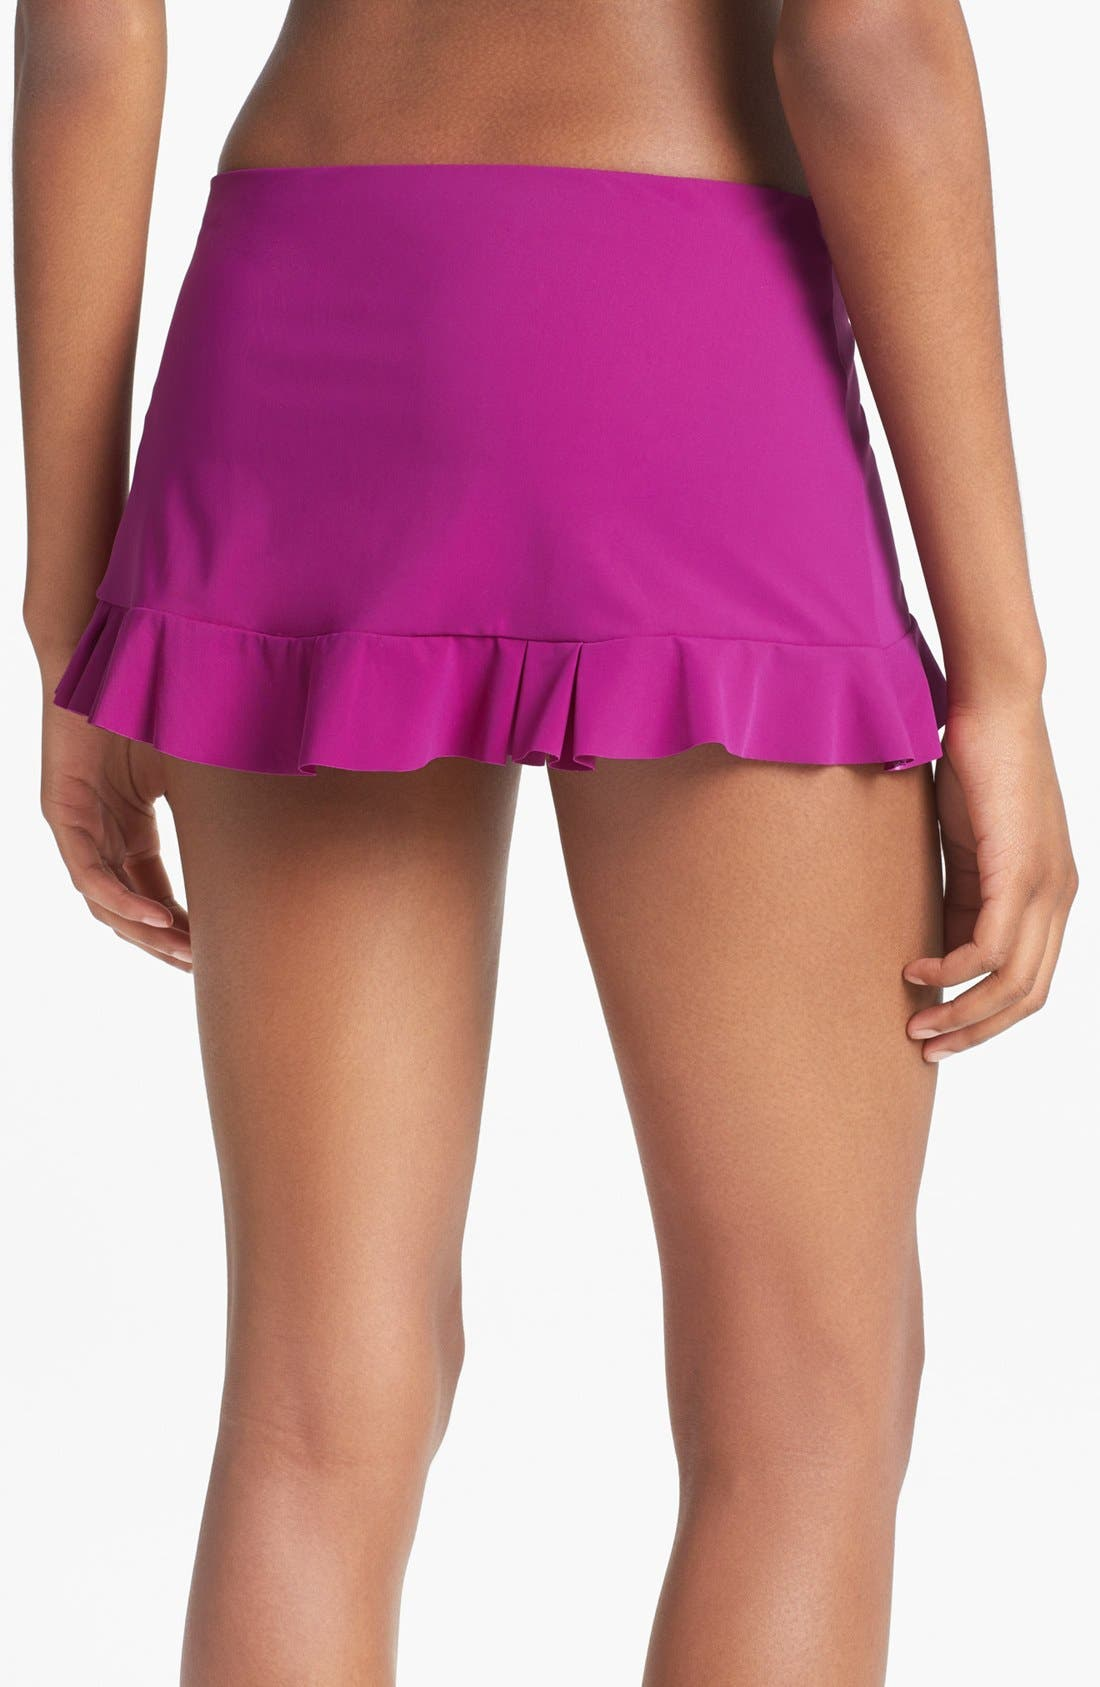 Alternate Image 2  - Profile by Gottex 'Starlet' Skirted Bikini Bottoms